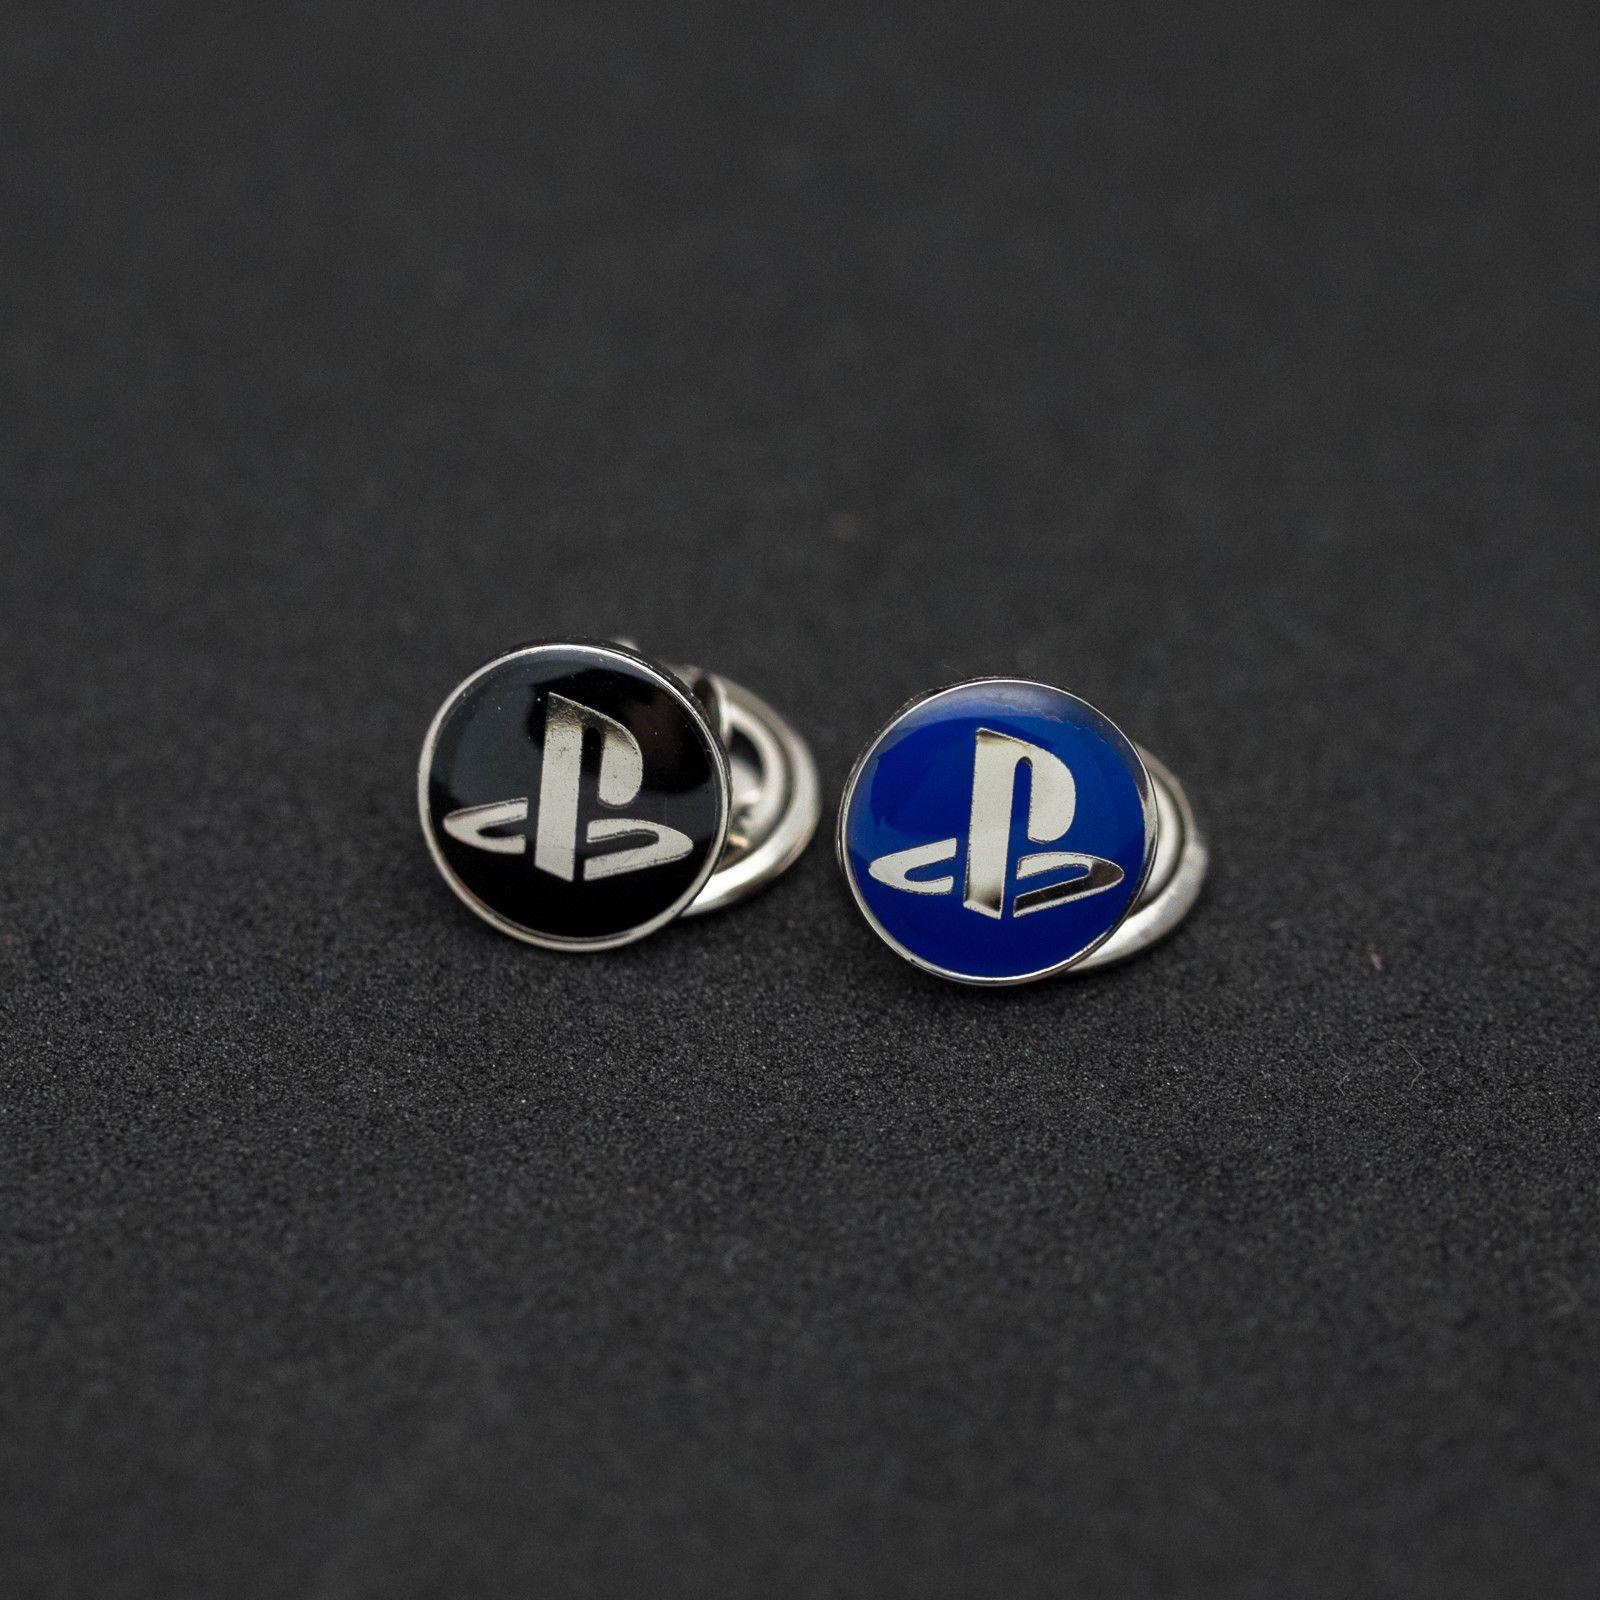 9 99 lapel pin metal badge sony playstation ps4 ps pins ebay electronics